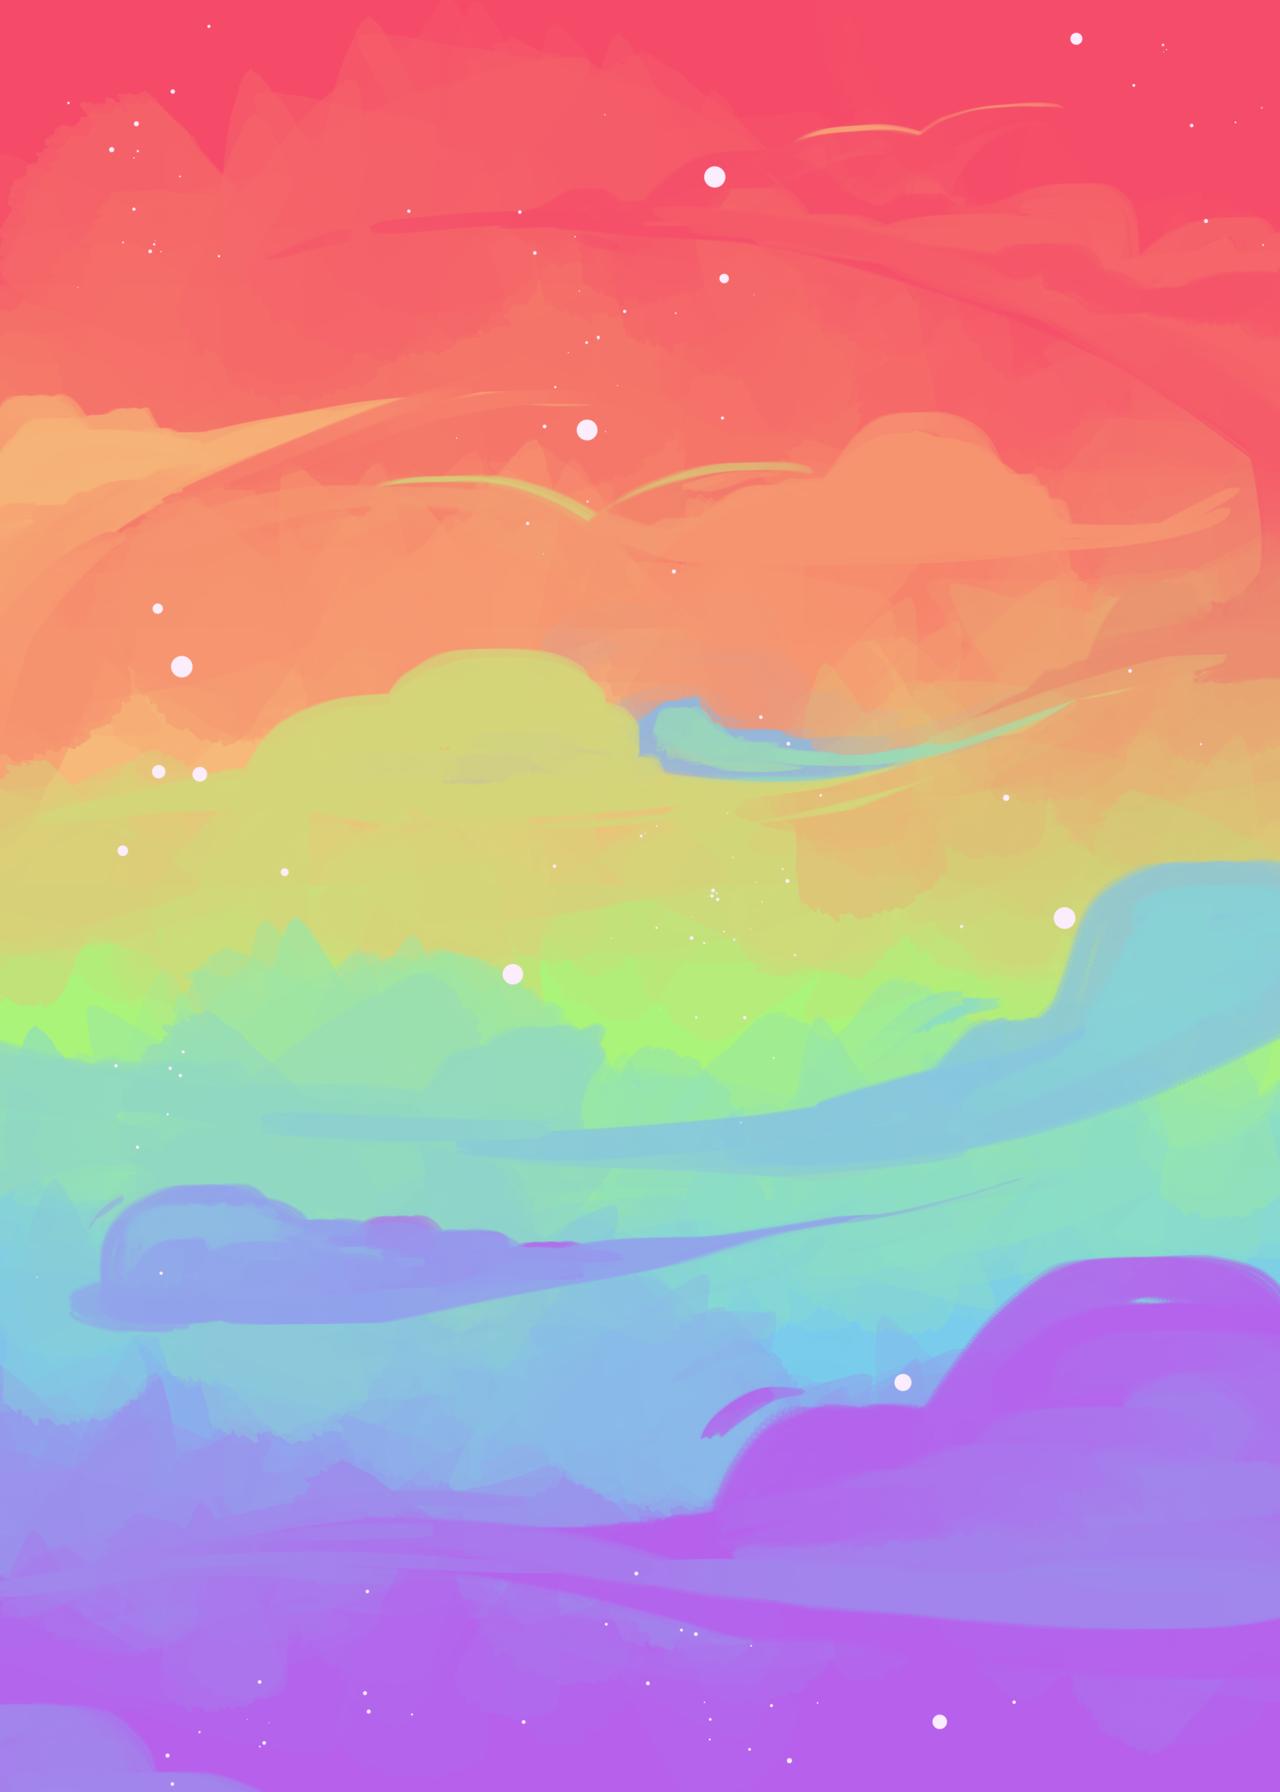 Art By Lielking On Tumblr In 2020 Rainbow Wallpaper Cute Wallpapers Aesthetic Wallpapers